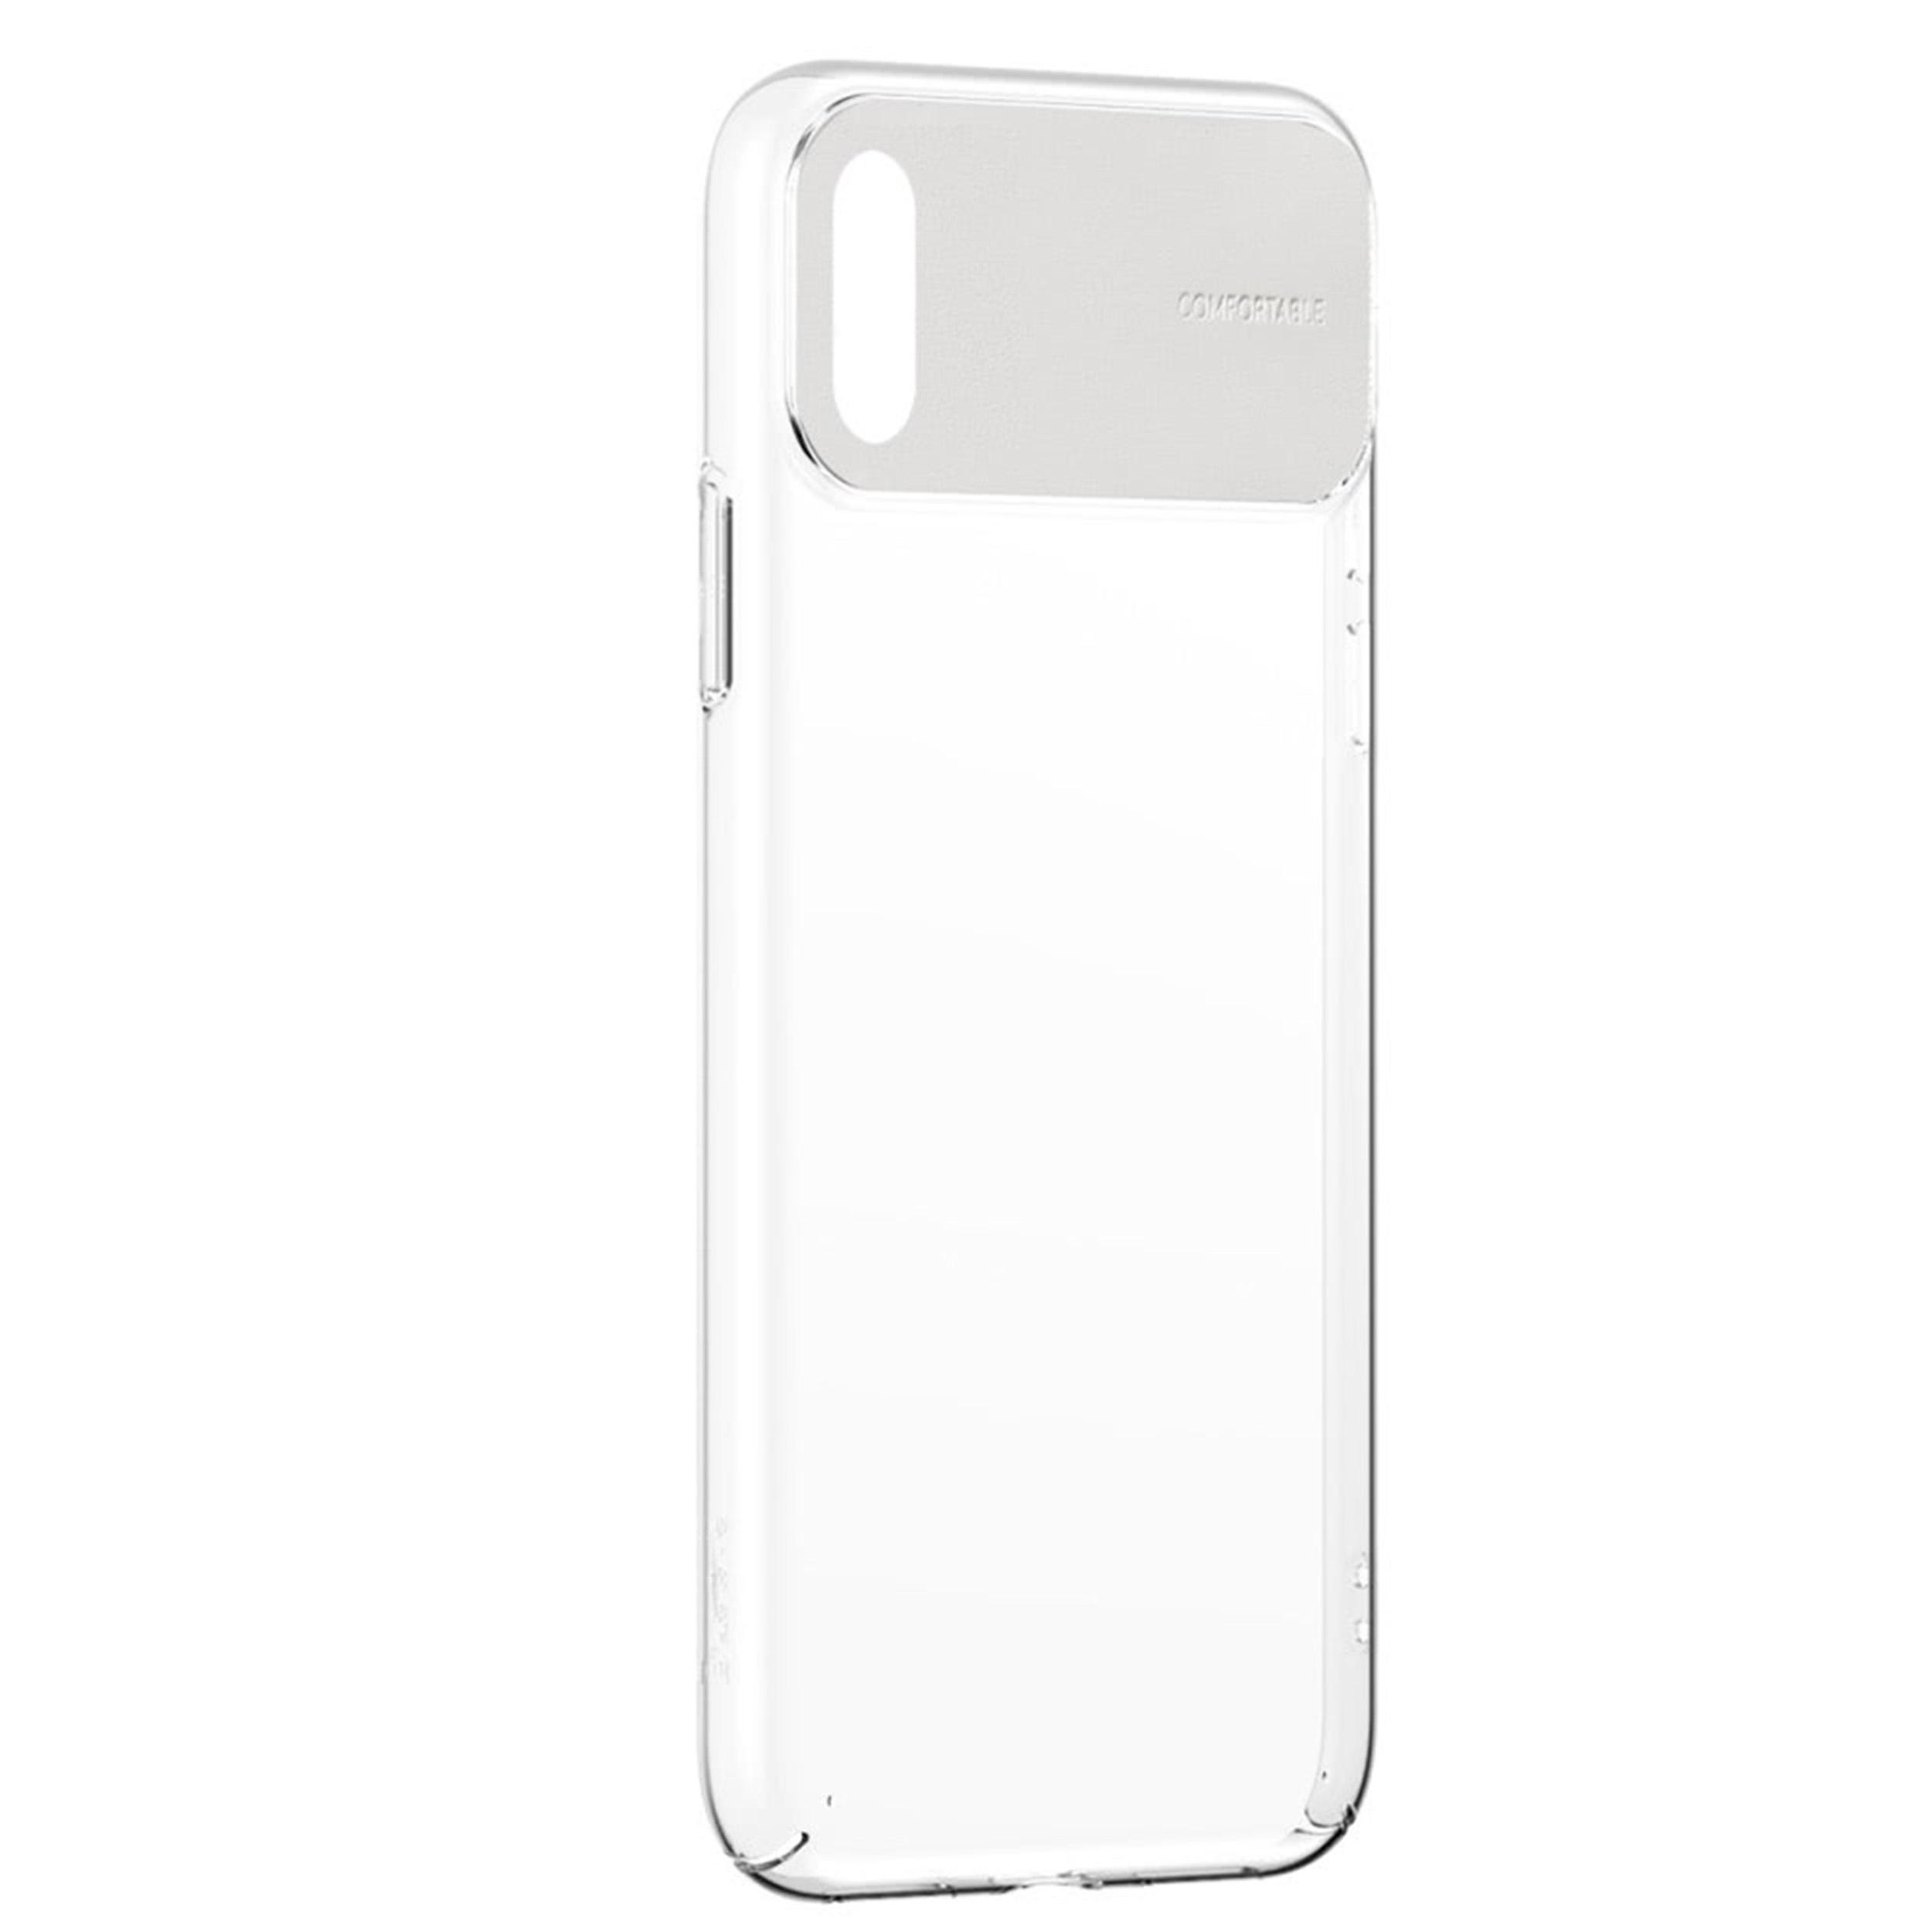 کاور باسئوس مدل WIAPIPH61-SS13 مناسب برای گوشی موبایل اپل iPhone XR